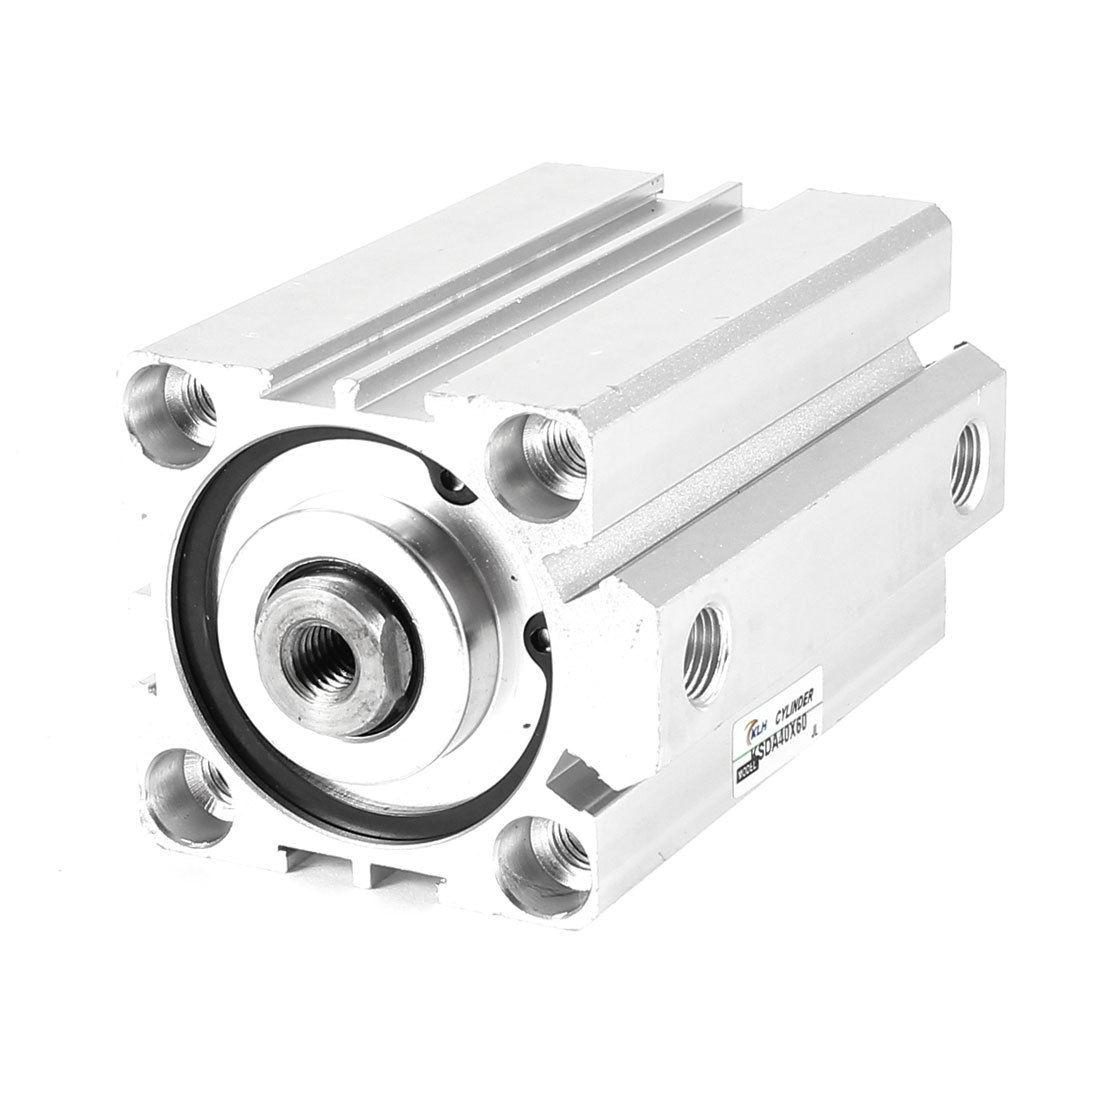 1 Pcs 50mm Bore 15mm Stroke Stainless steel Pneumatic Air Cylinder SDA50-15 1 pcs 50mm bore 25mm stroke stainless steel pneumatic air cylinder sda50 25